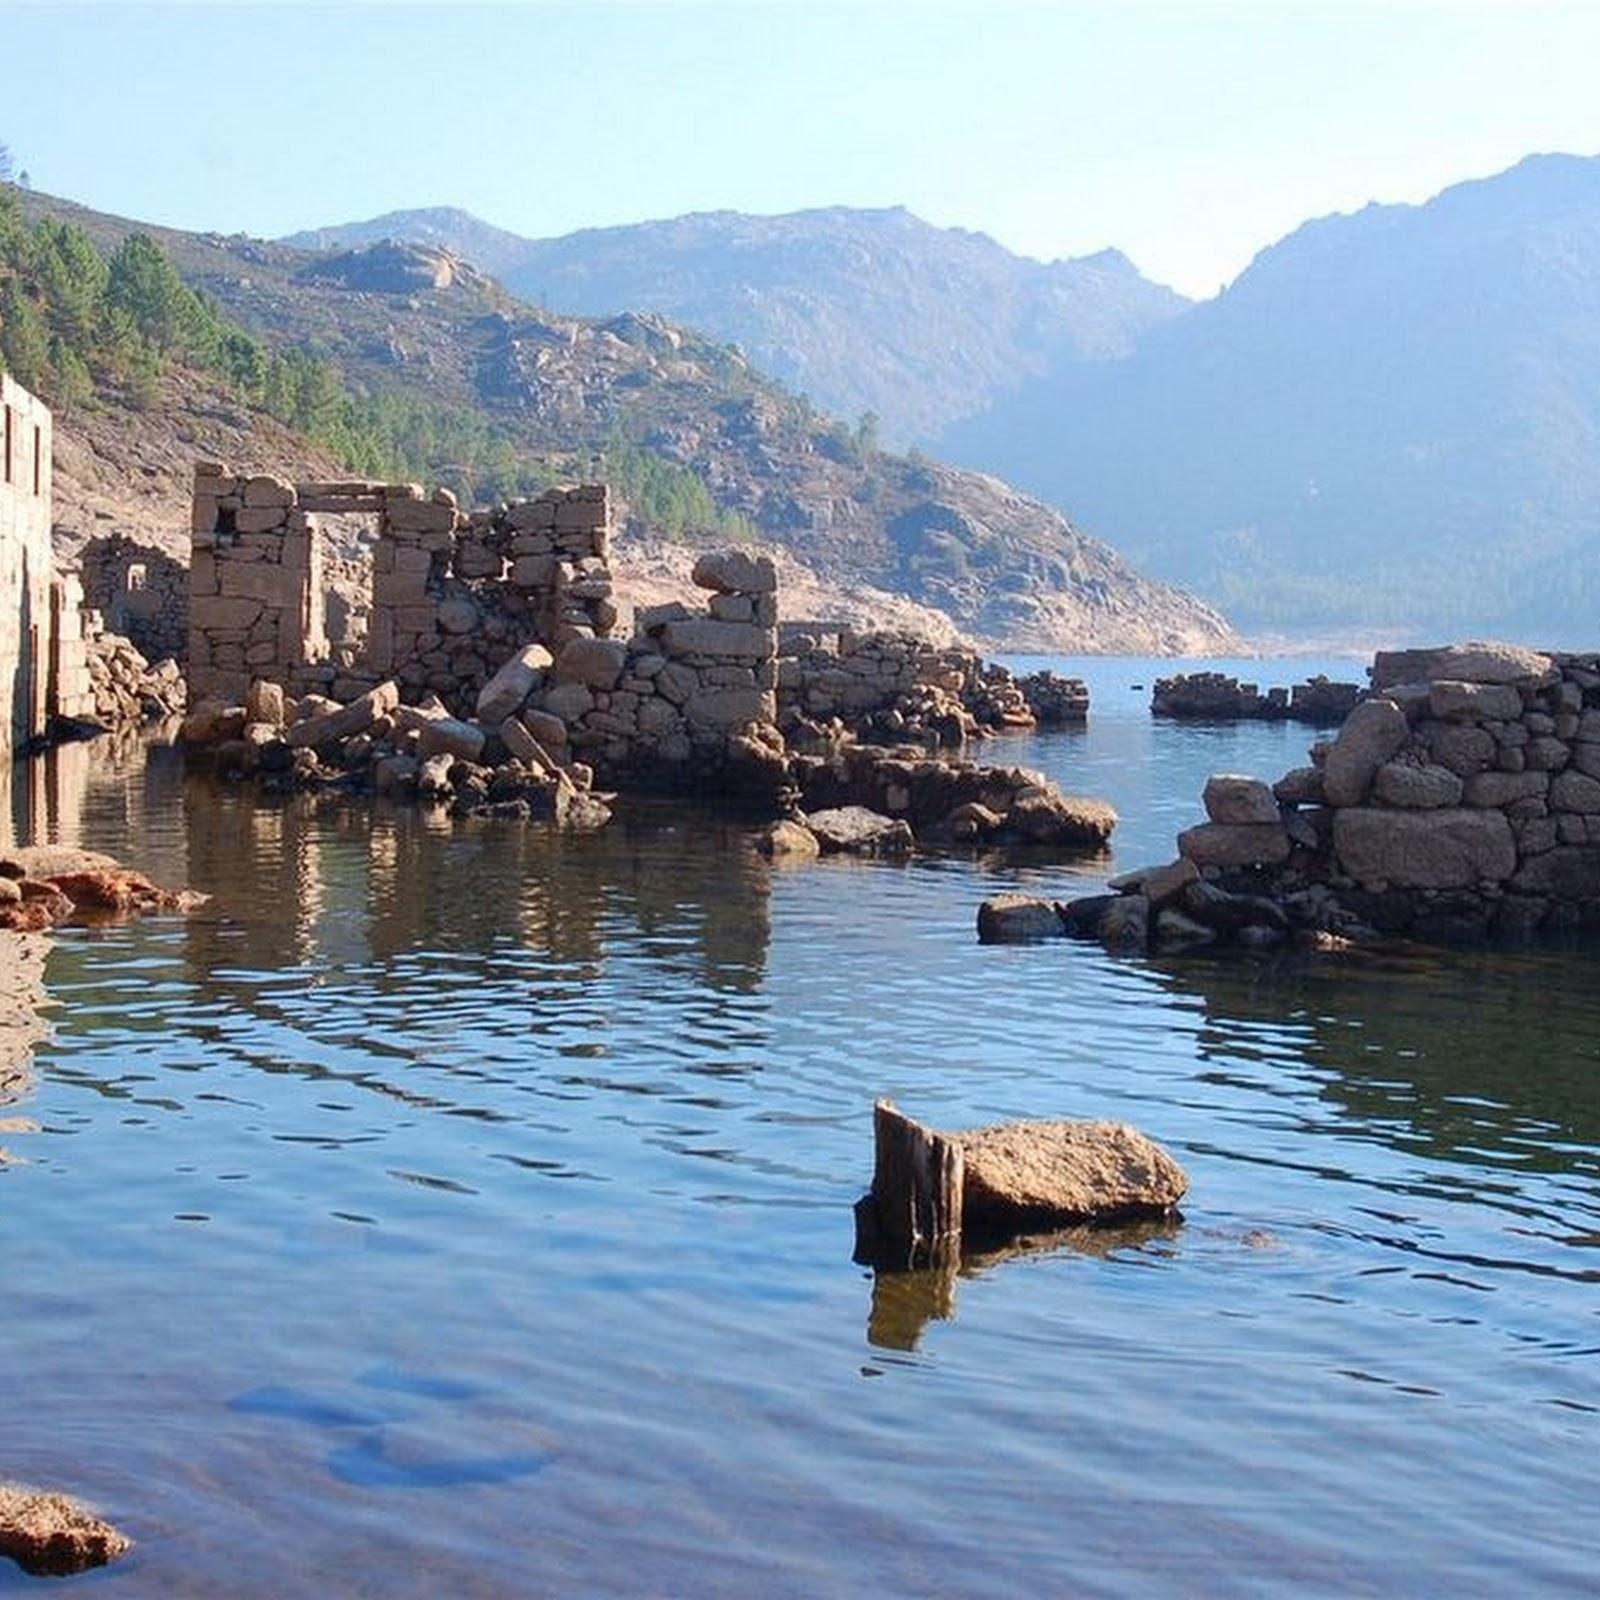 Vilarinho da Furna: A Drowned Roman Village